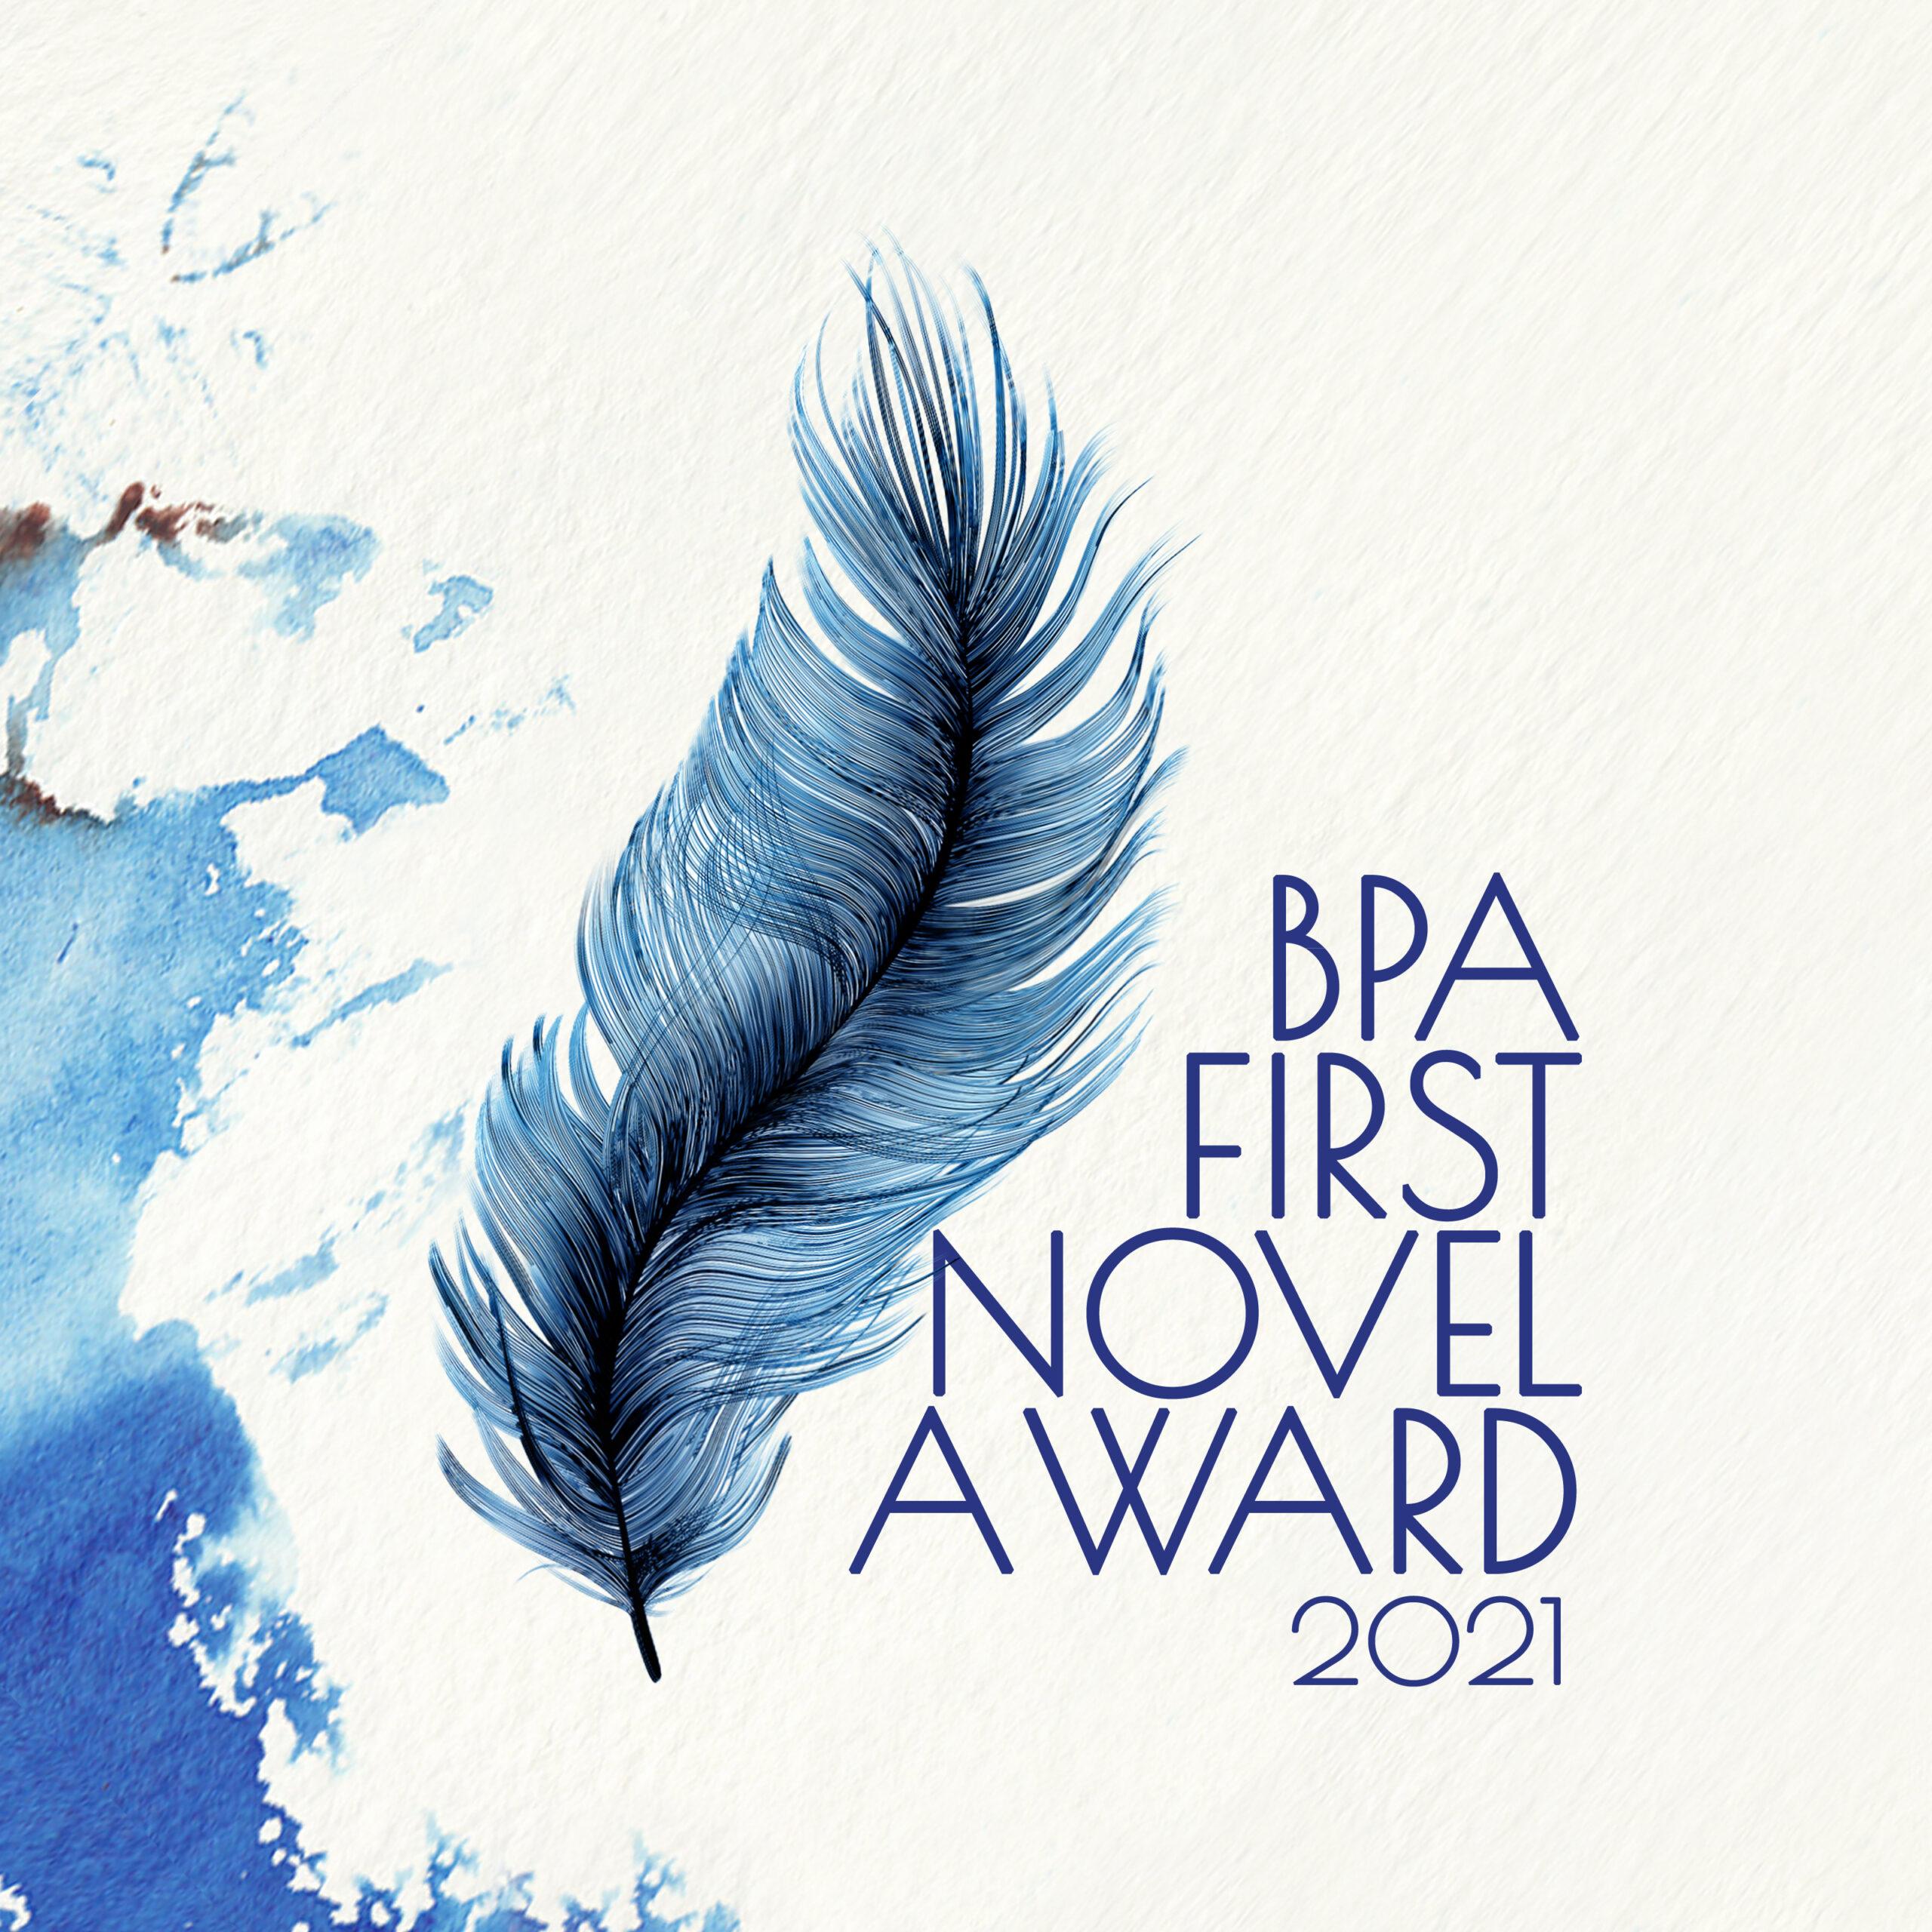 BPA First Novel Award